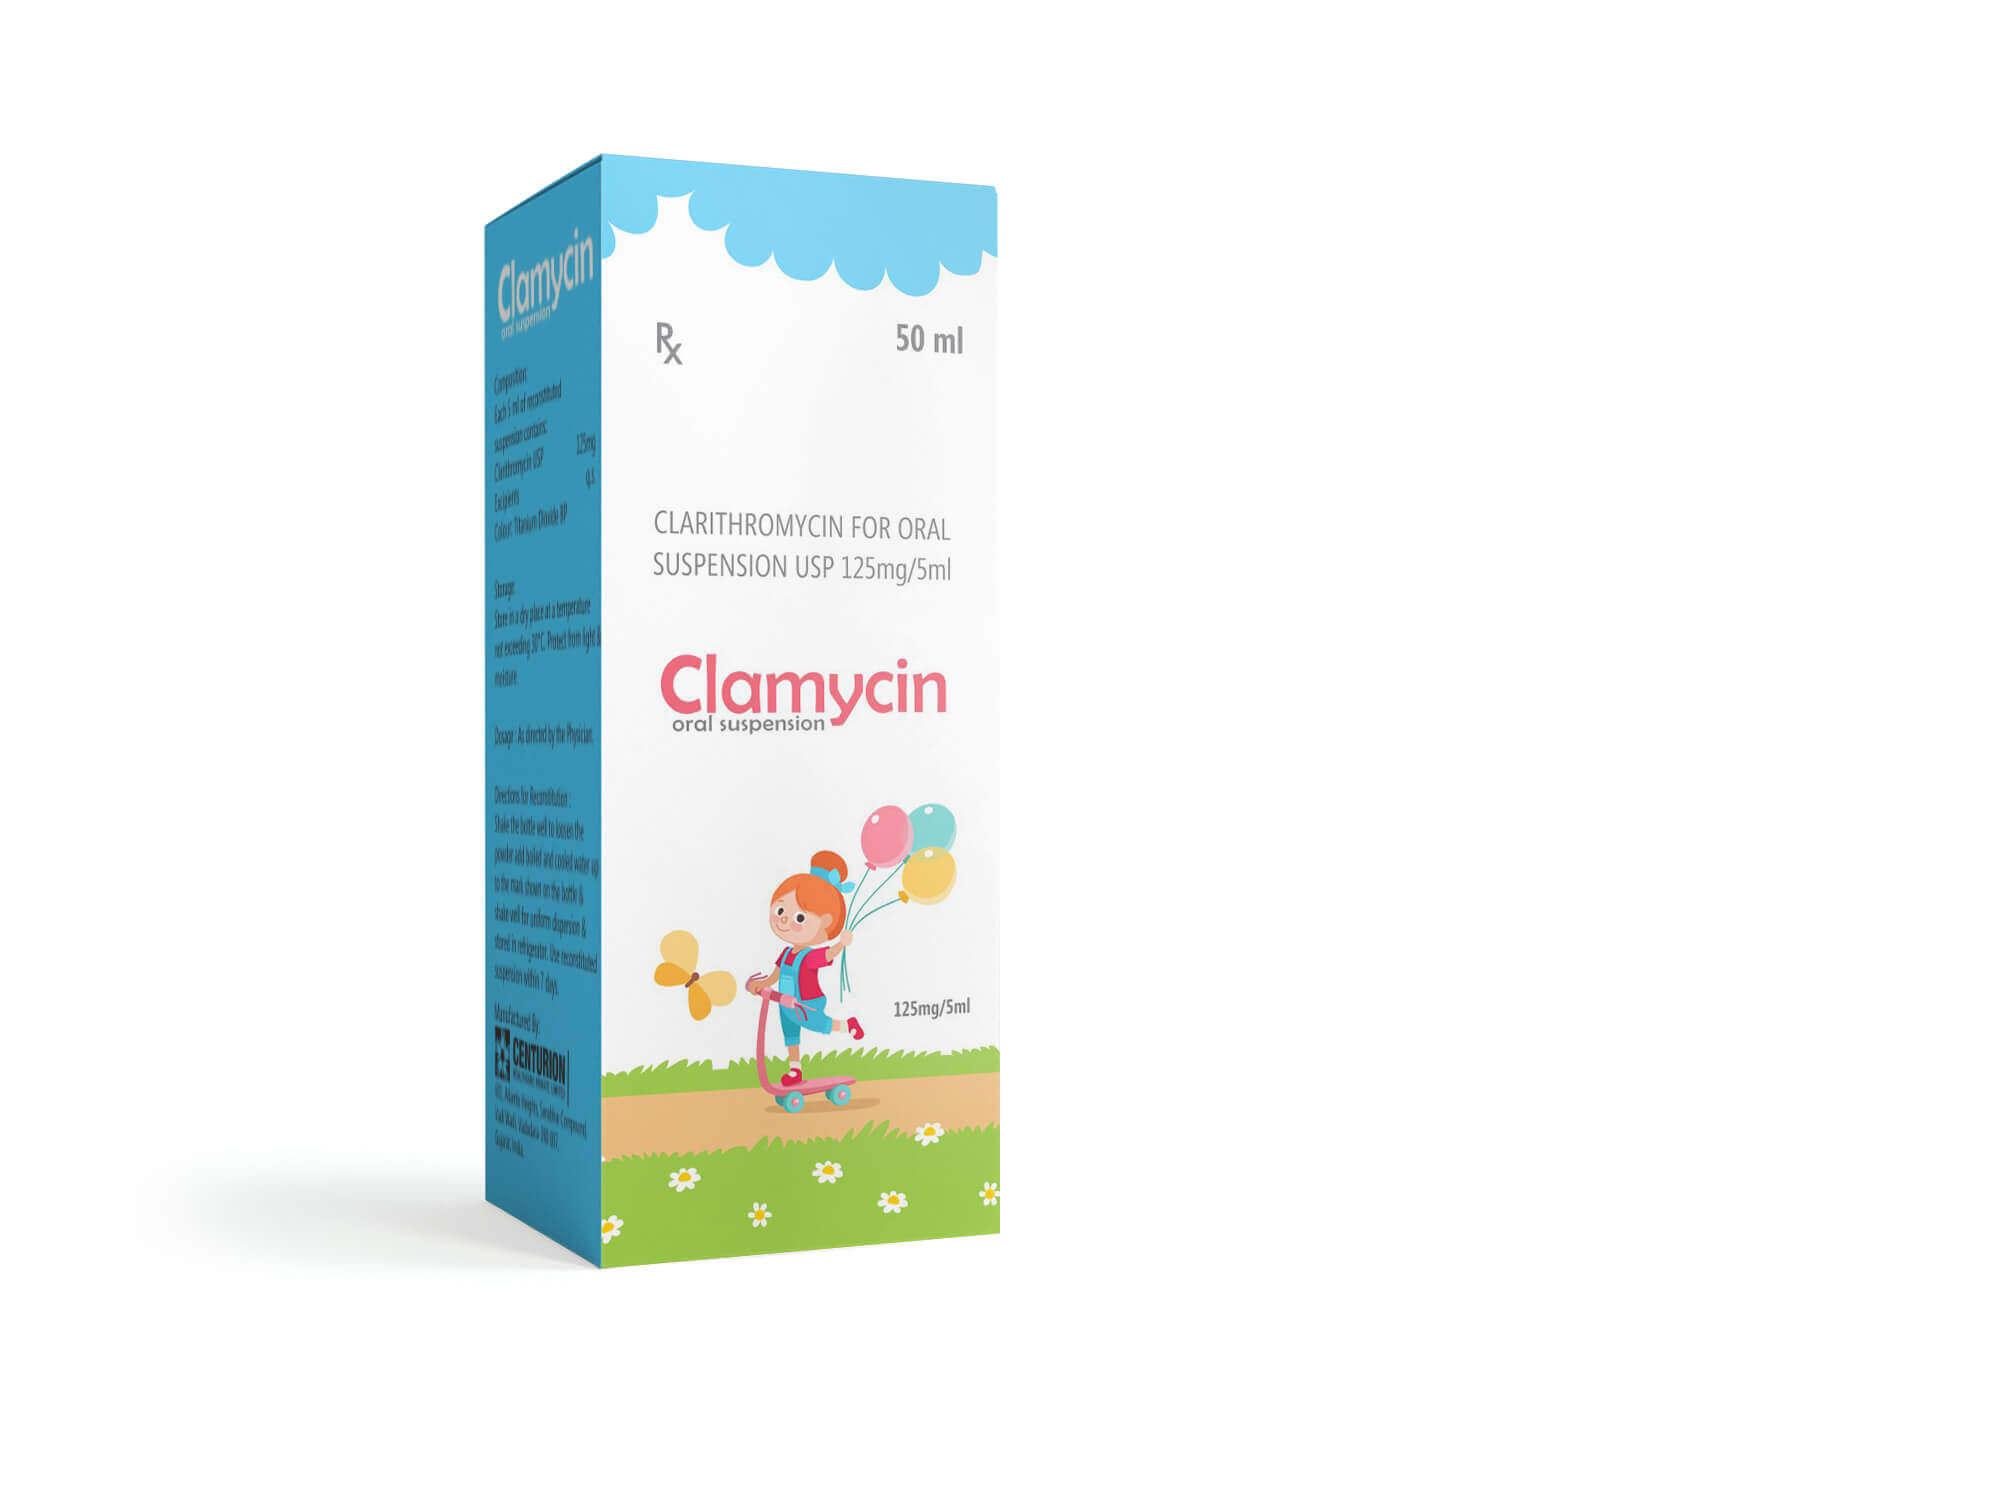 Oral Suspension USP 125mg per 5ml Clarithromycin